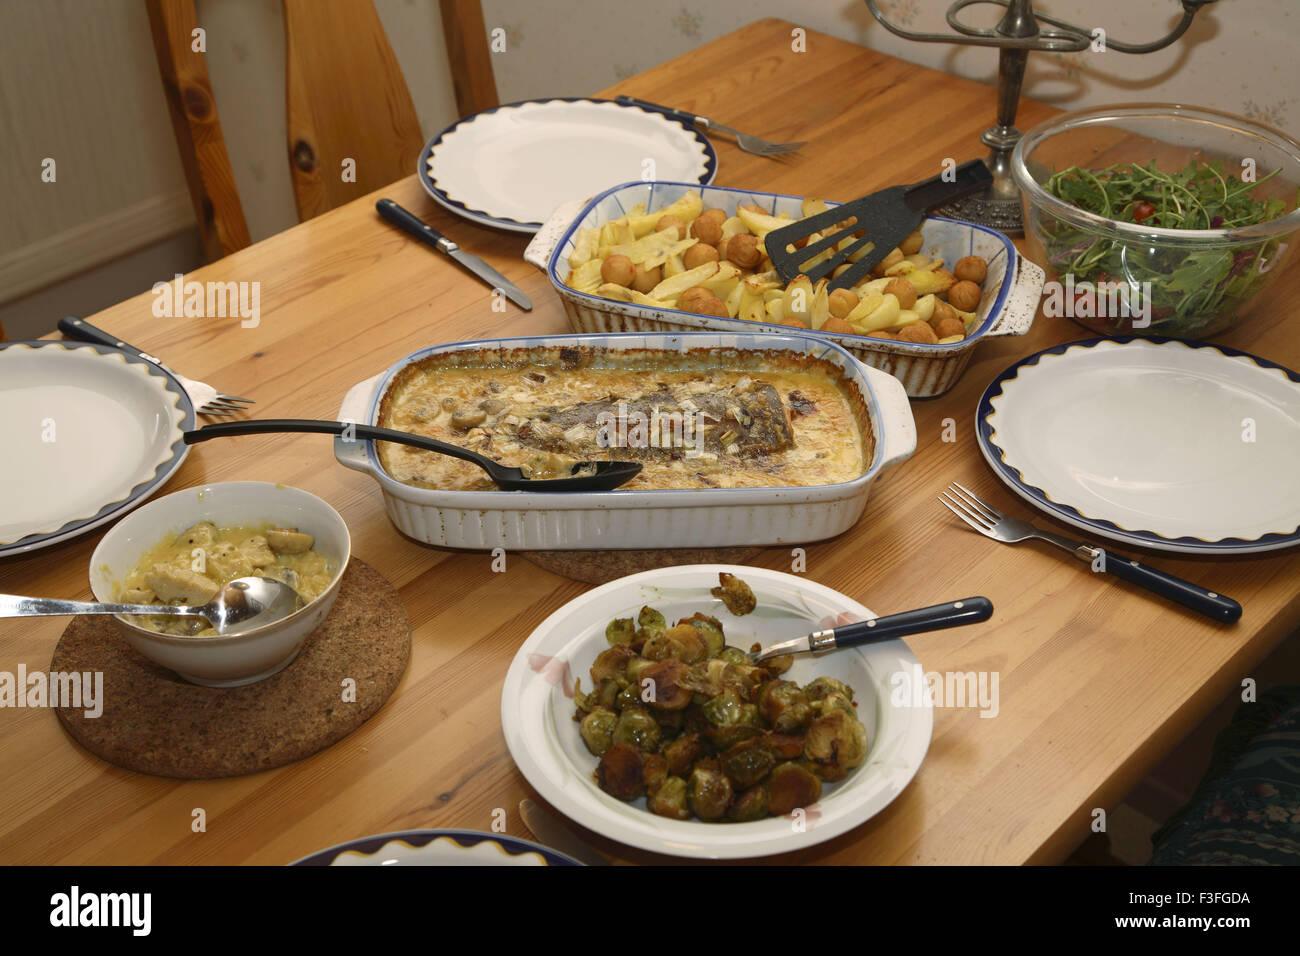 Food Continental Served Bowls Dining Table Potatoes Salmon Fish Vegetable Quarn Rich Cream Mushroom Sauce Ruccollo Sweden